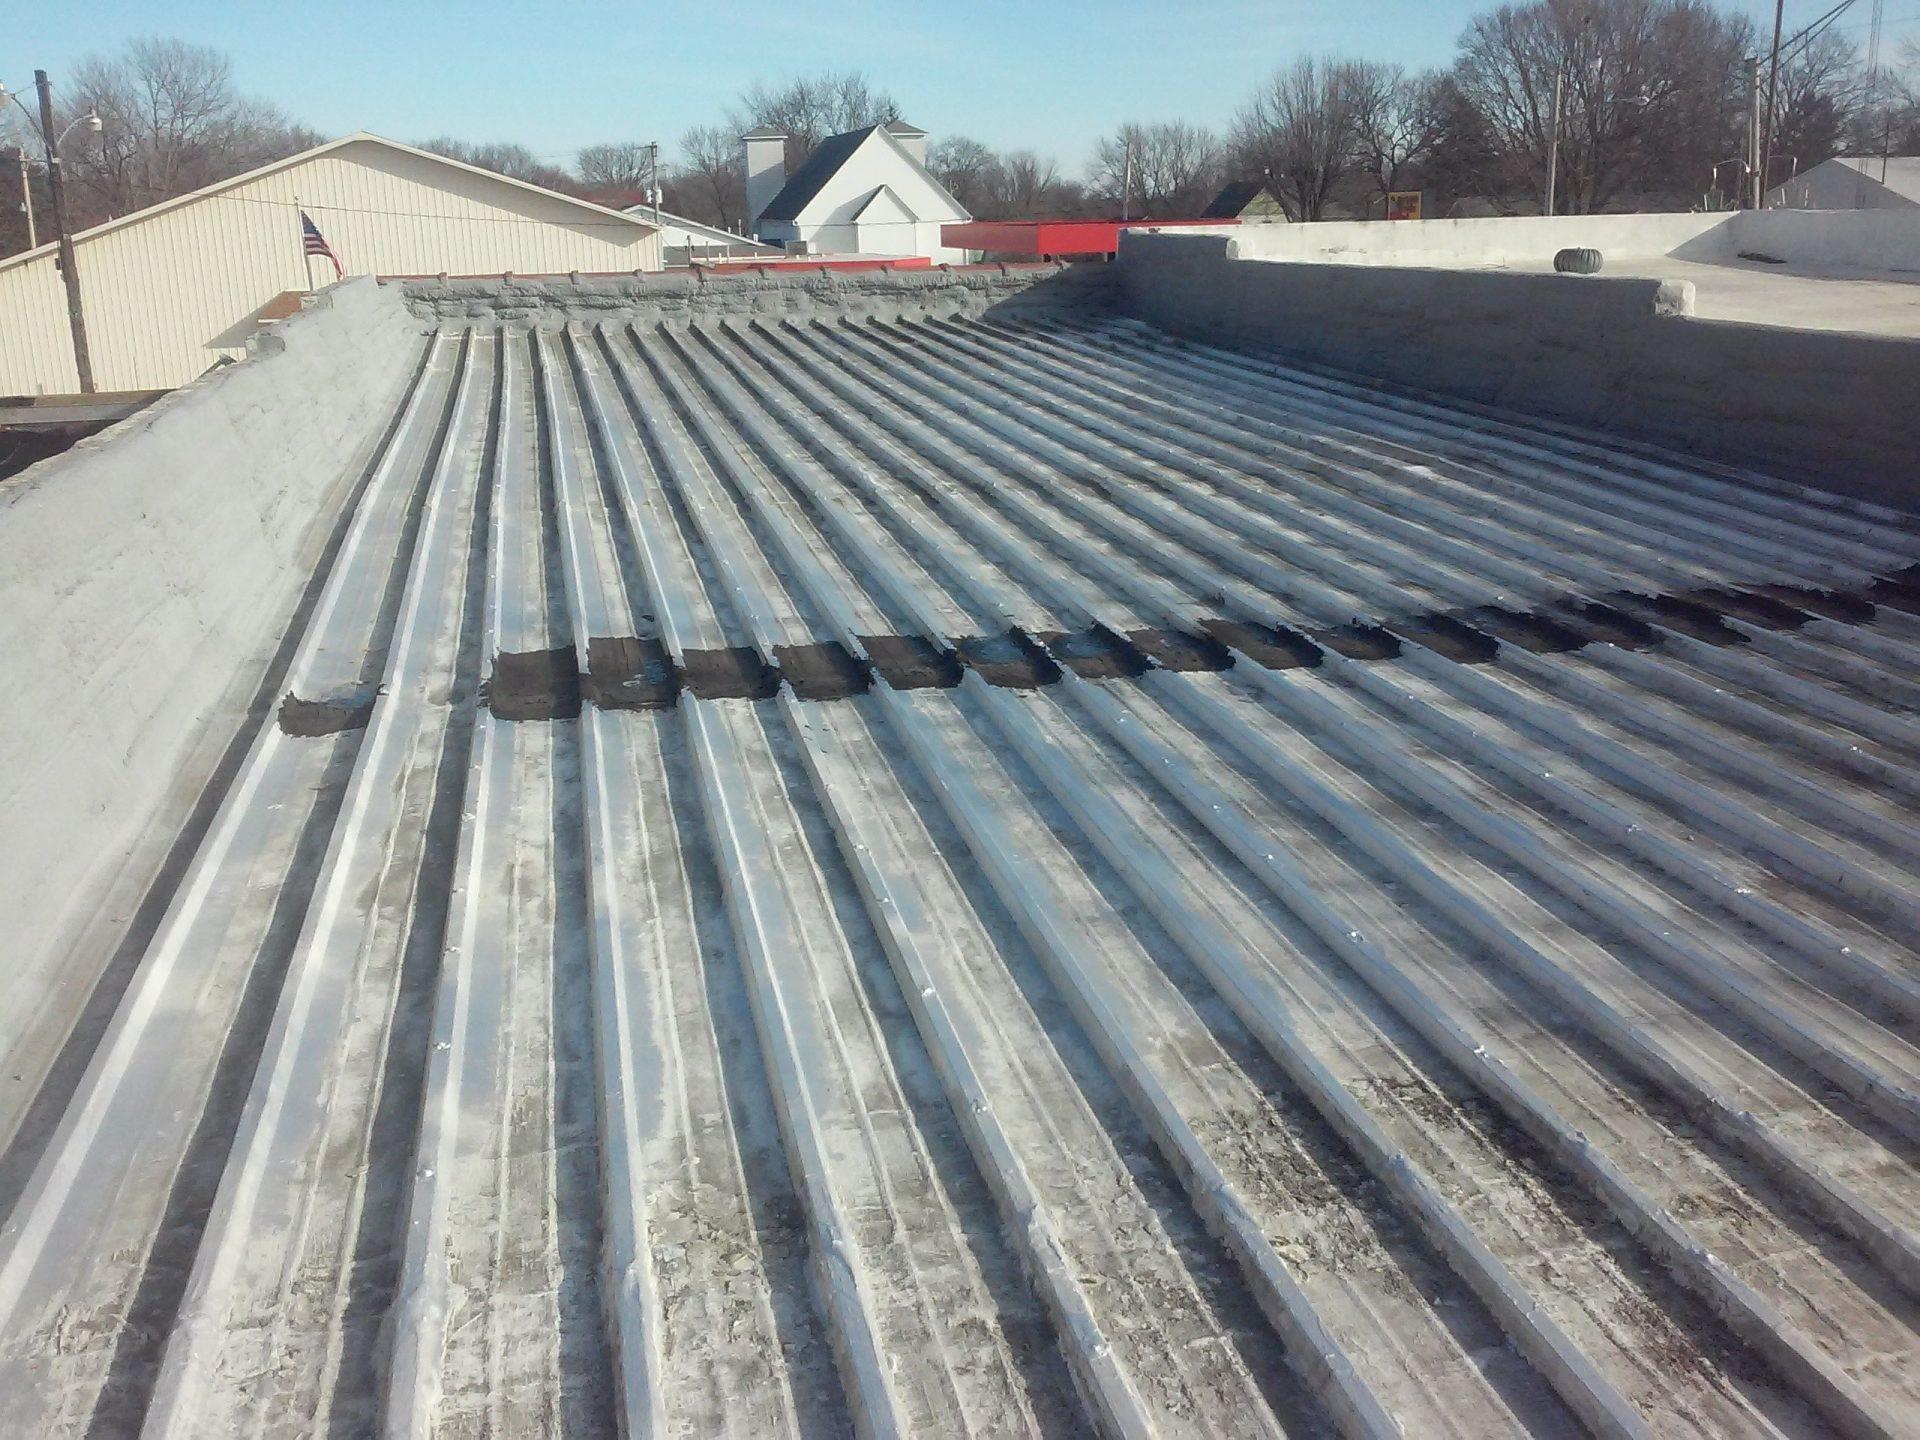 commercial roof restoration in progress